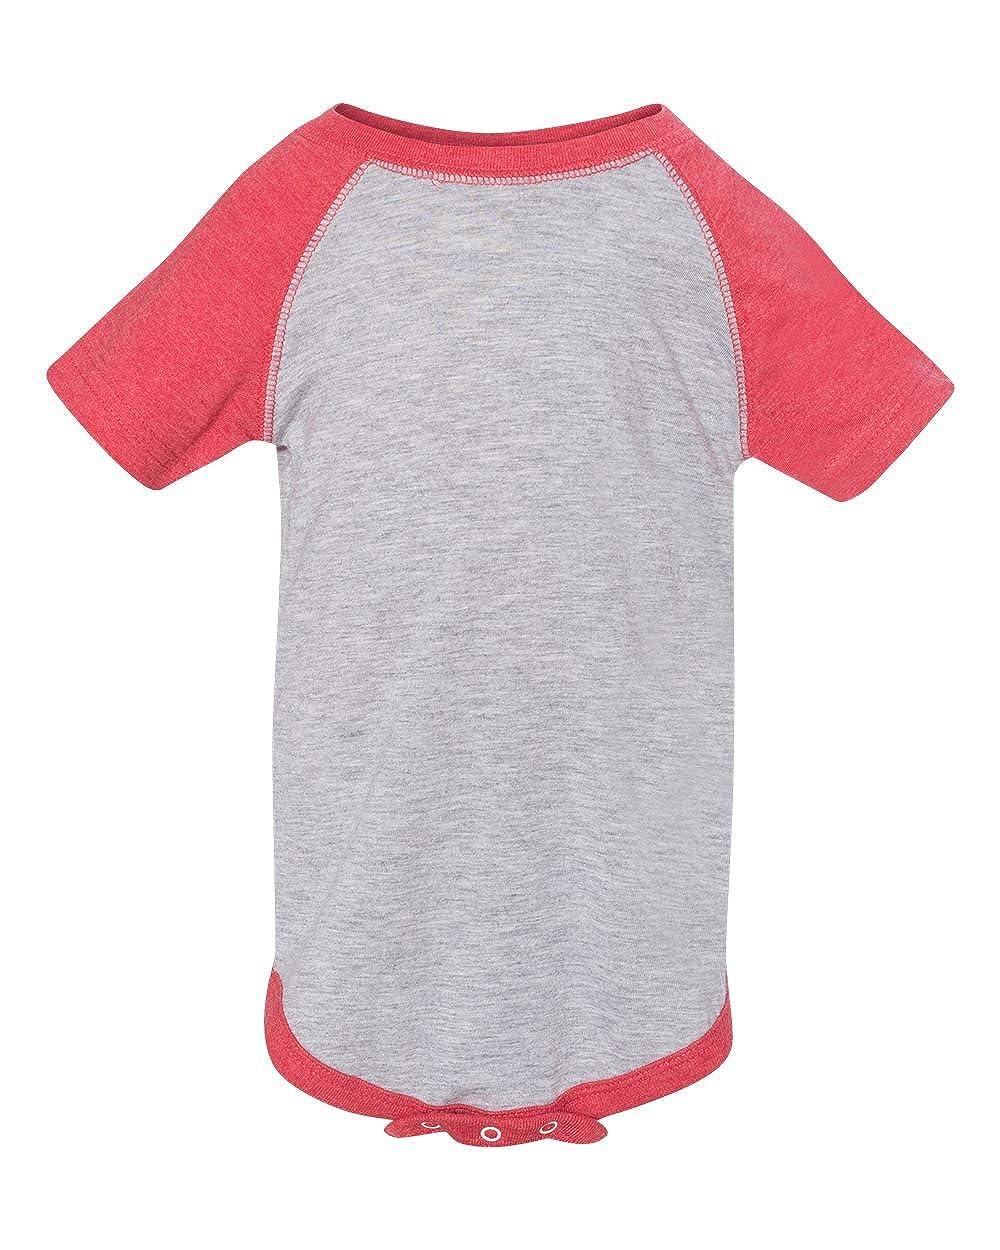 Clementine Infant Baseball Fine Jersey Bodysuit RS4430 VN Heather//V 18MOS